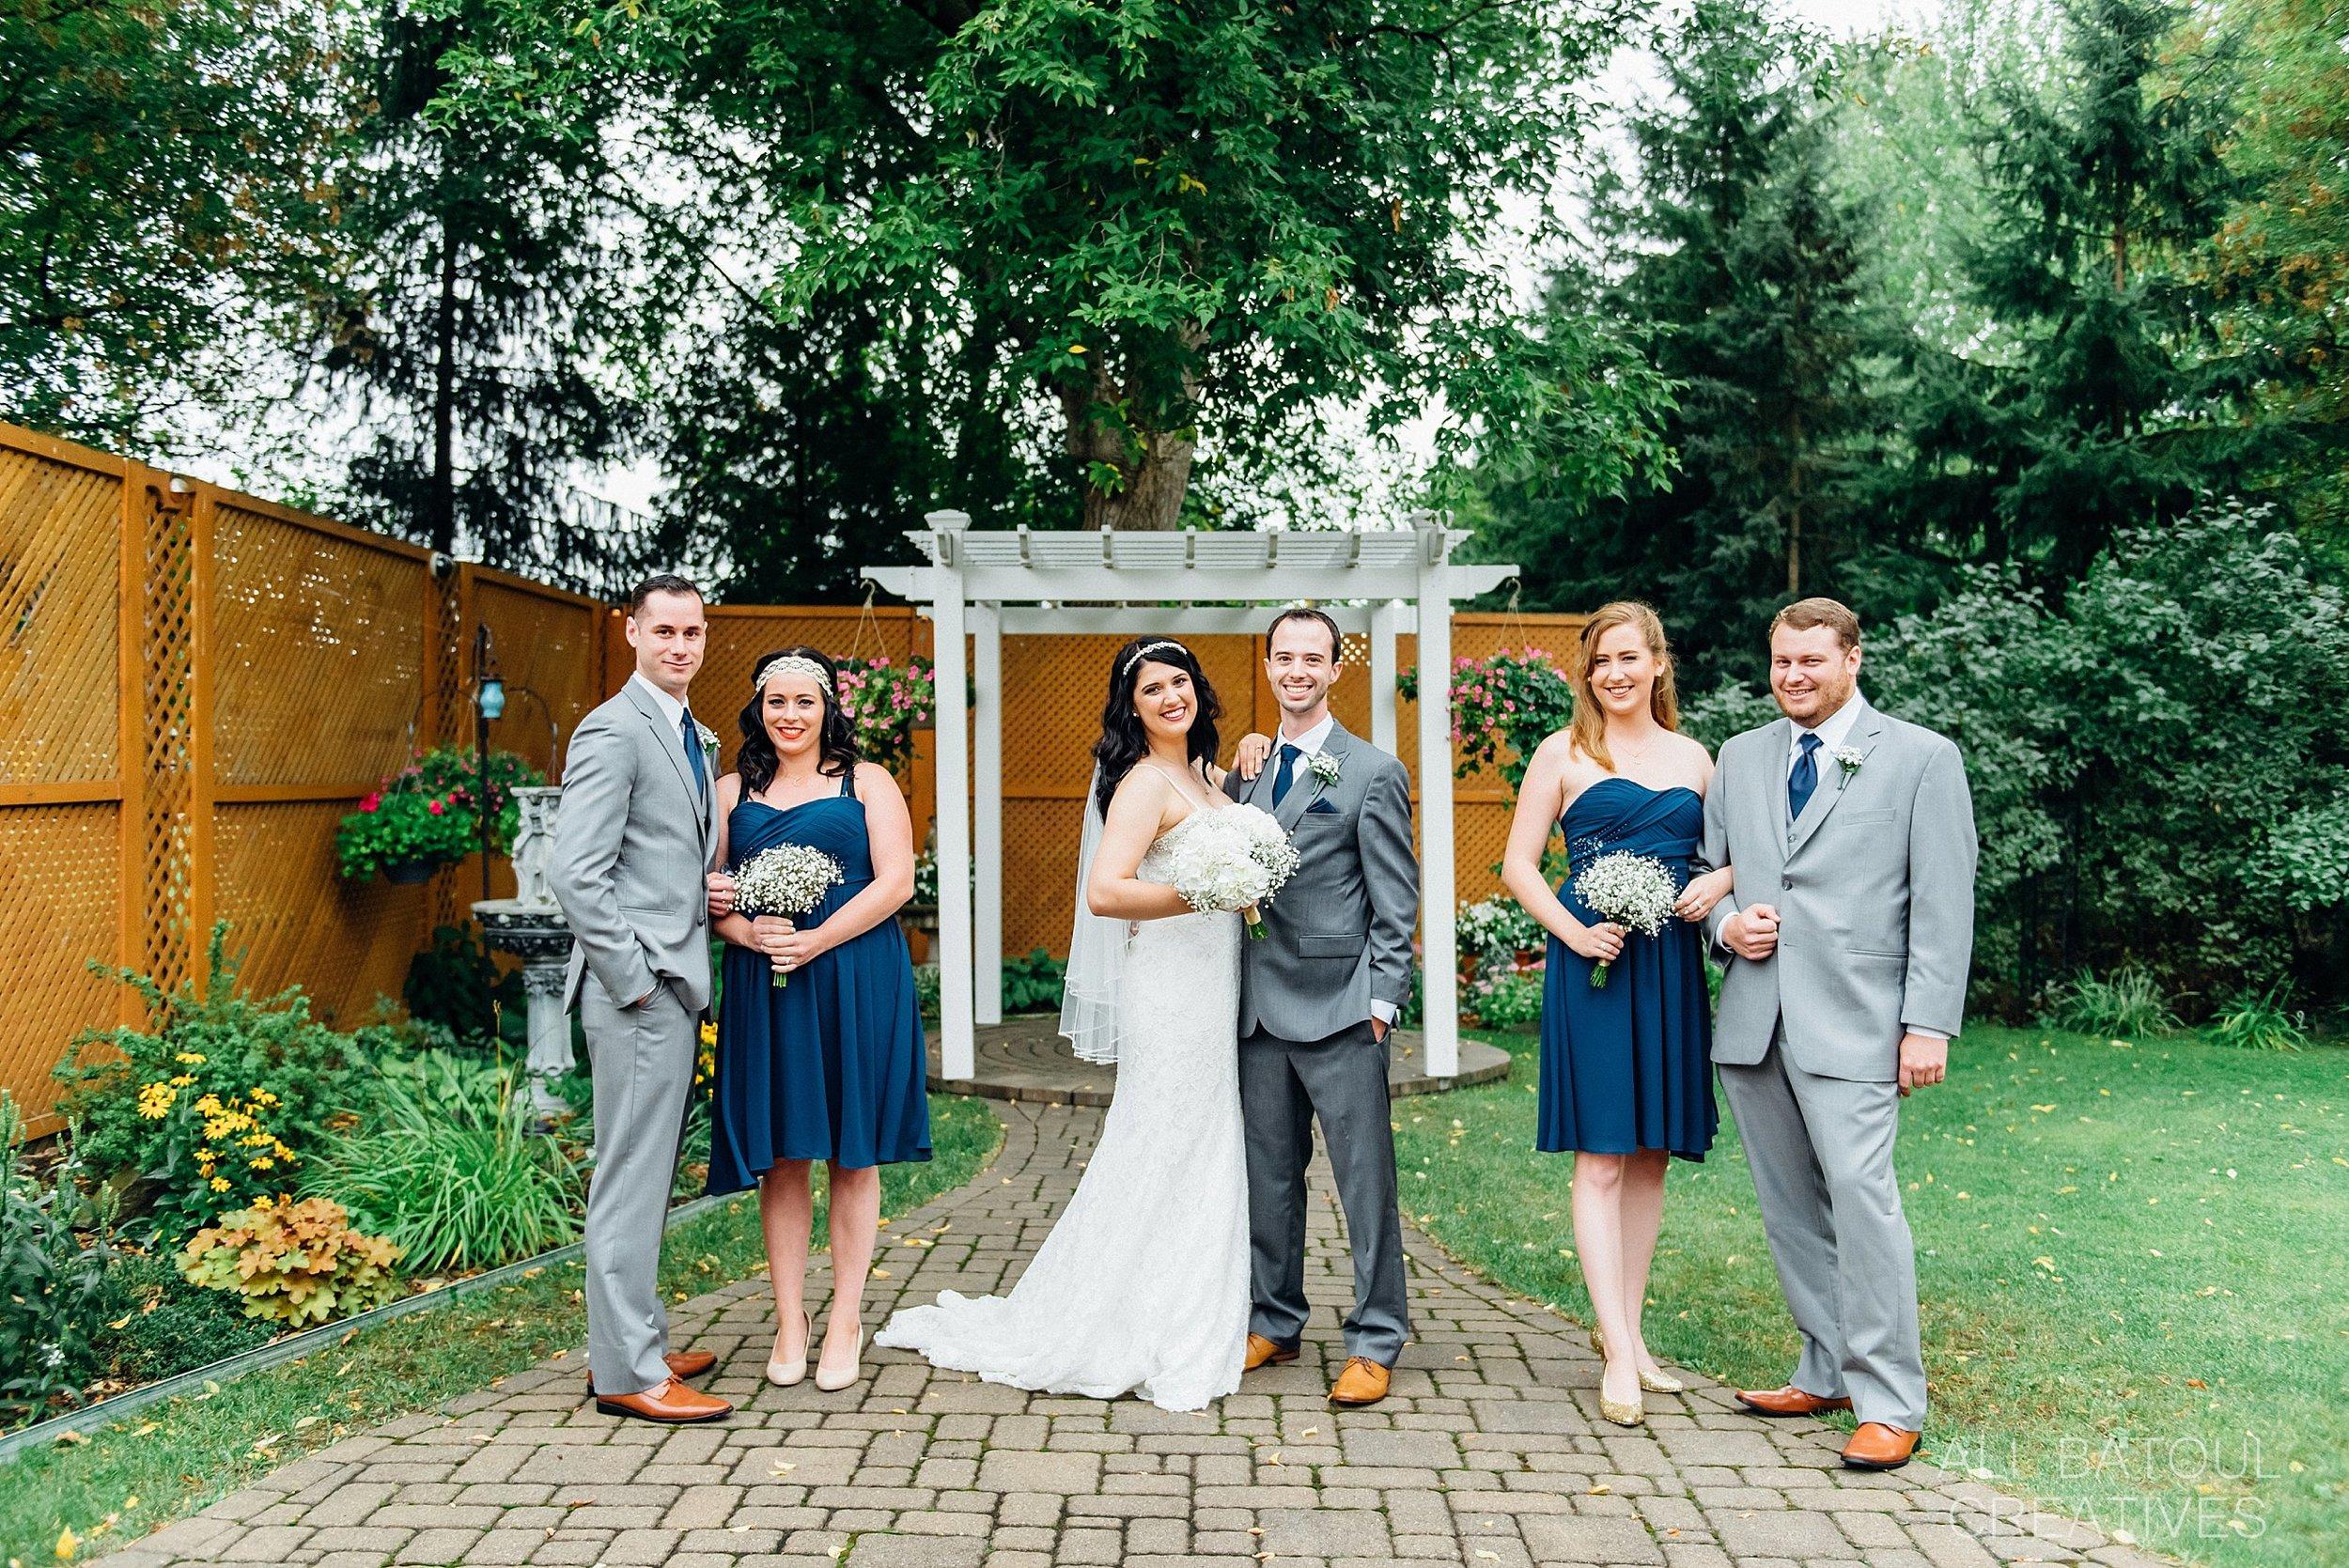 Jocelyn + Steve At The Schoolhouse Wedding - Ali and Batoul Fine Art Wedding Photography_0054.jpg